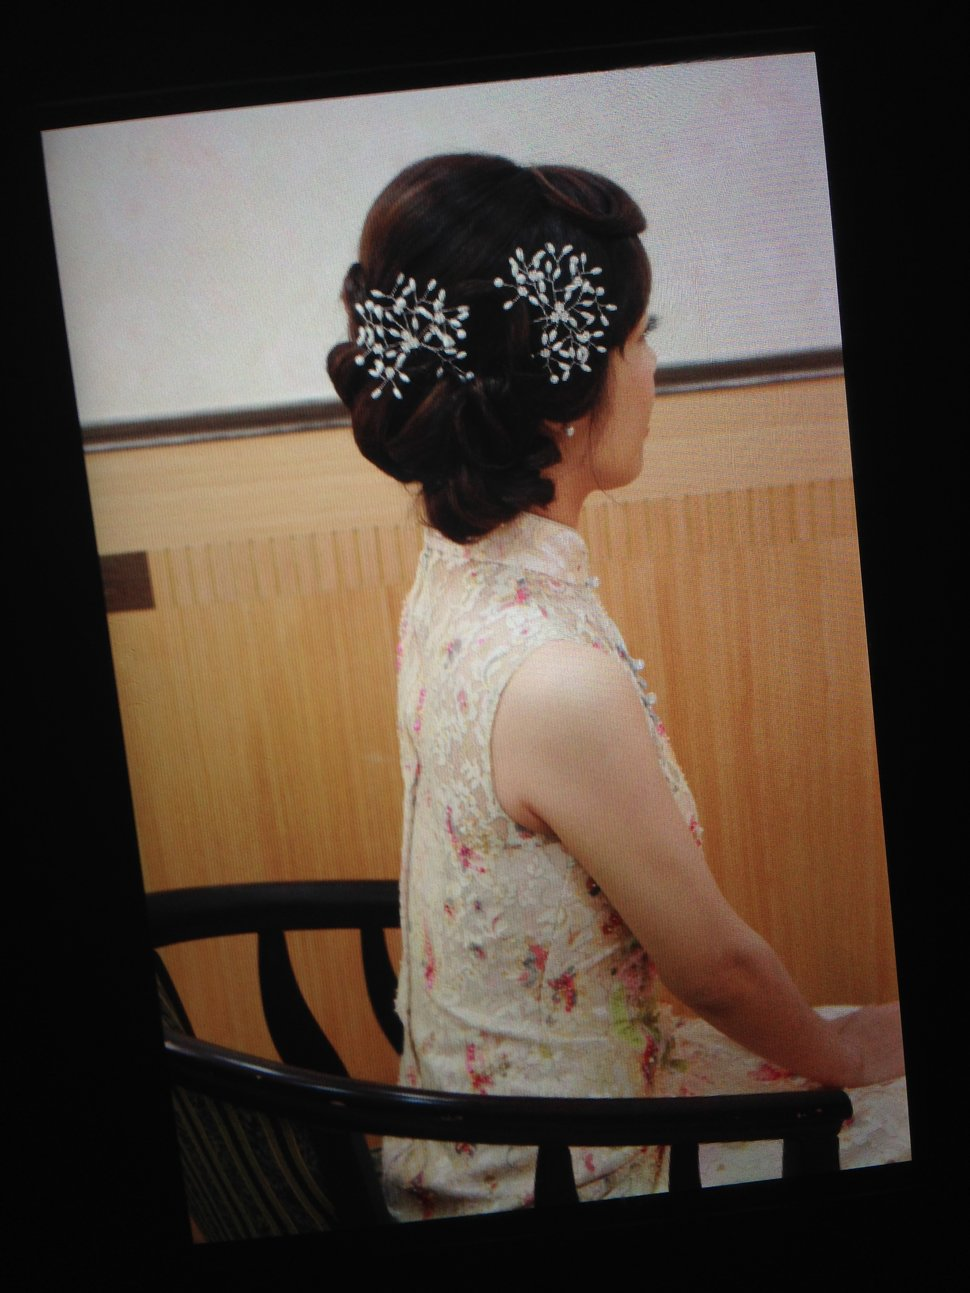 【SUN Studio新娘秘書】婚宴造型 MIAW(編號:428281) - SUN Studio-珊珊 新娘秘書 - 結婚吧